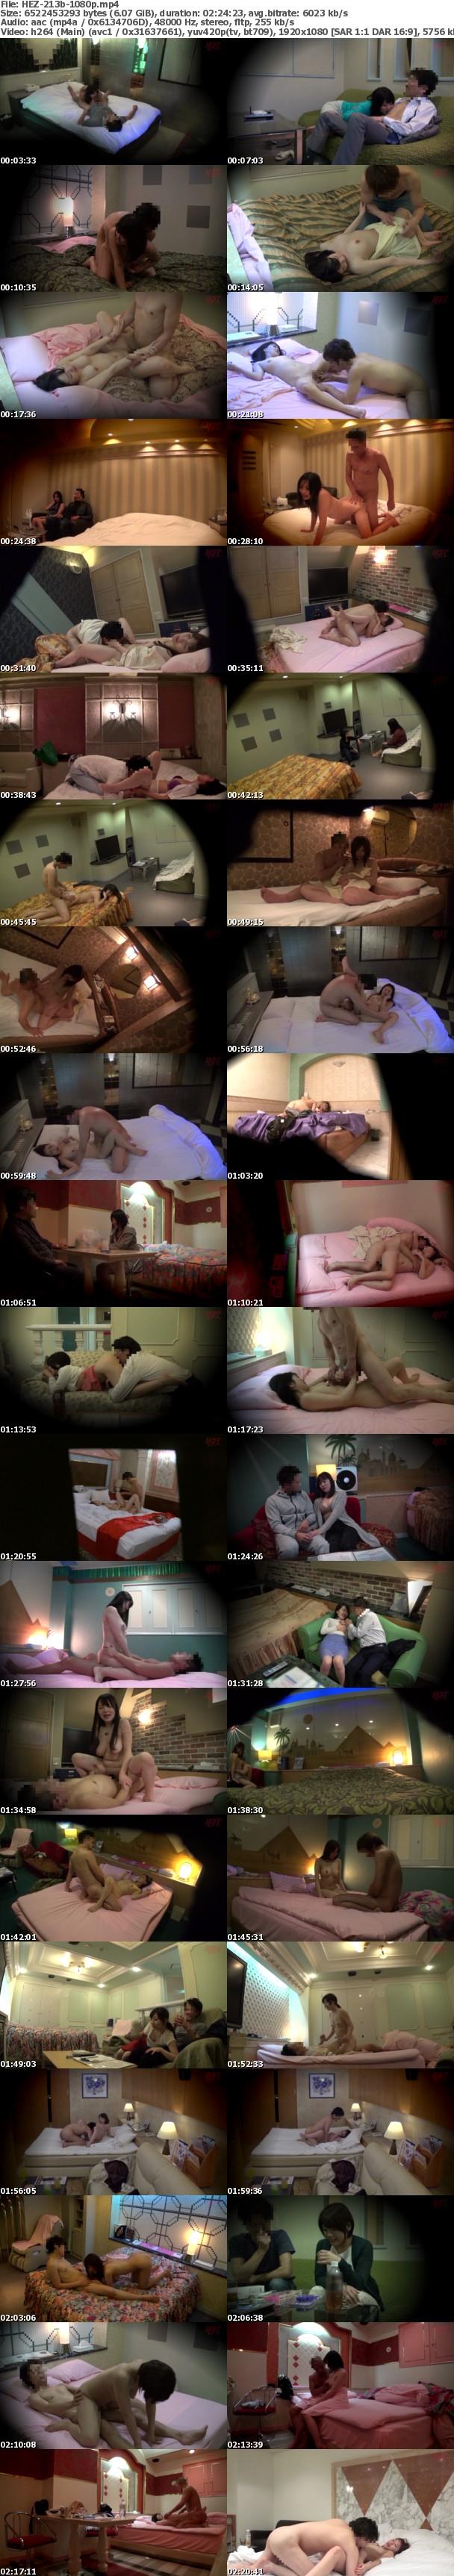 (Full HD) HEZ-213 日本全国ラブホ盗撮映像ベスト 50人5時間 PART.2